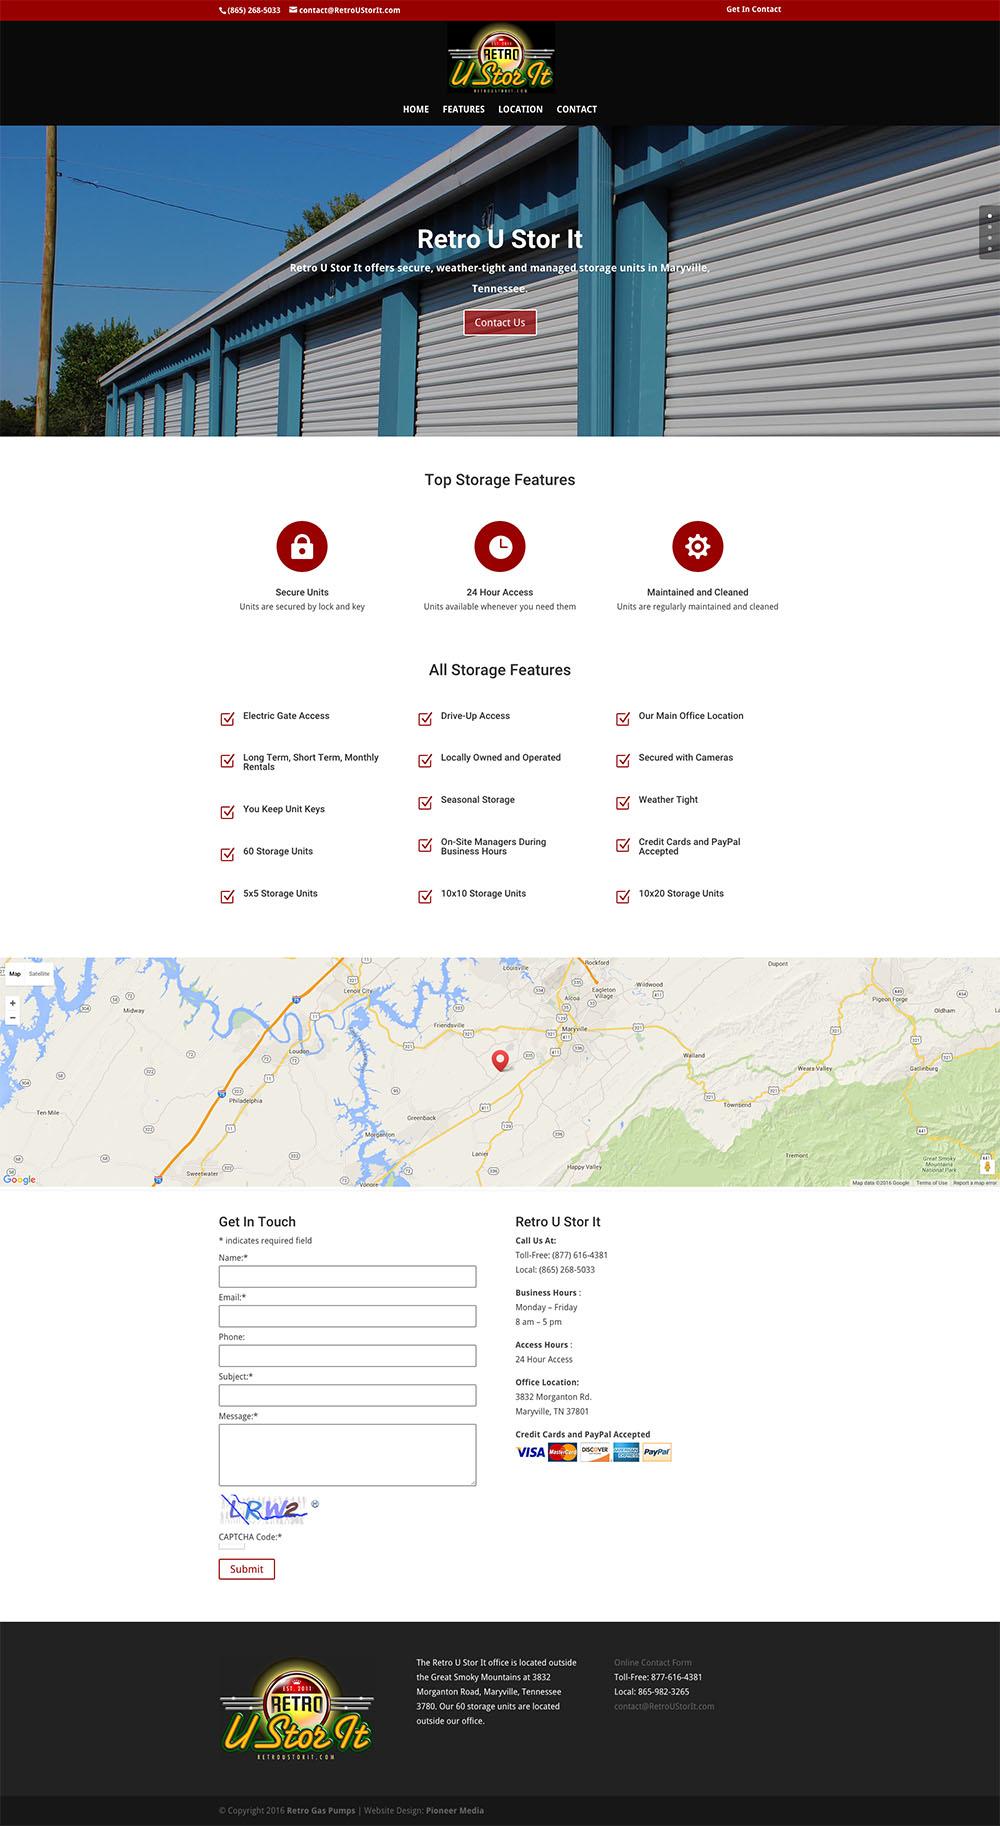 Retro U Stor It One-Page Web Design